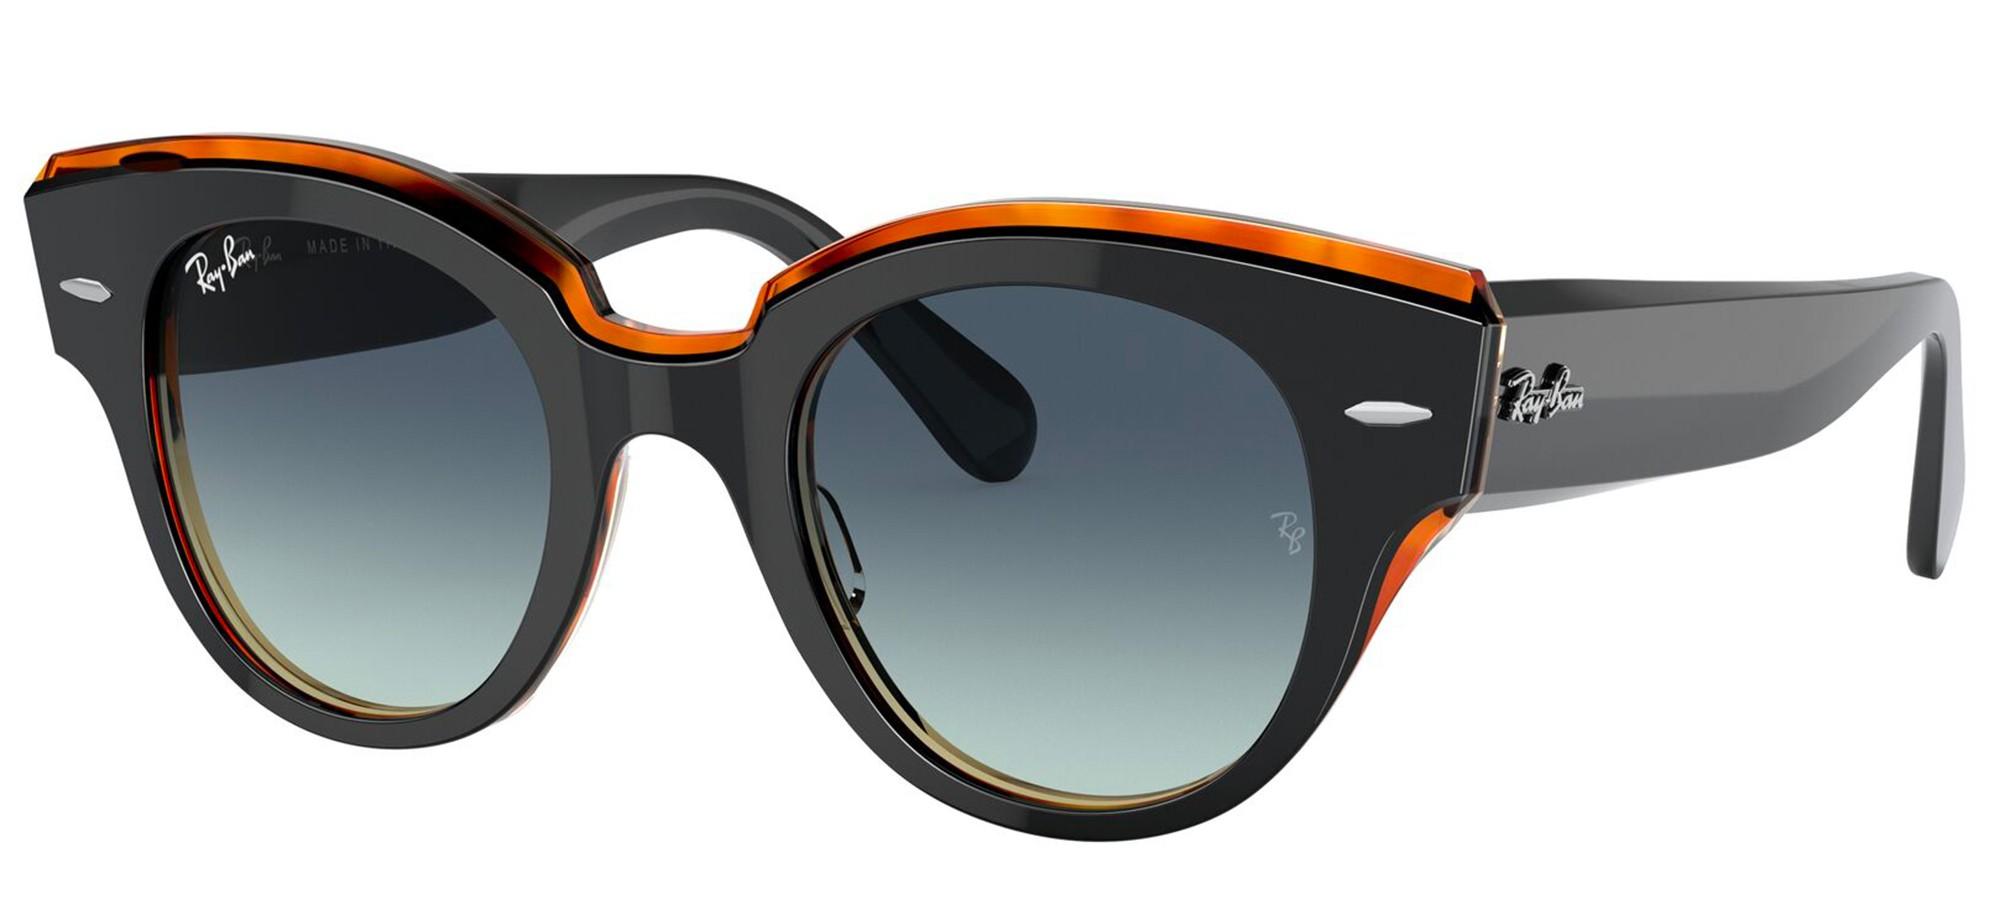 Ray Ban Roundabout 2192 132241 - Oculos de Sol